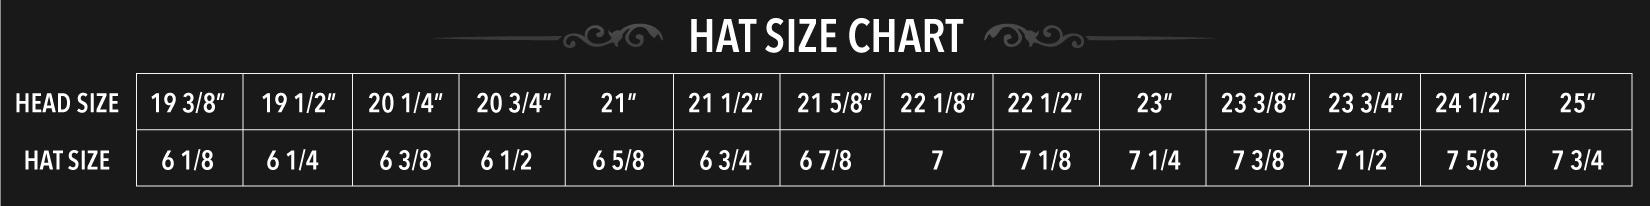 Hat Size Chart